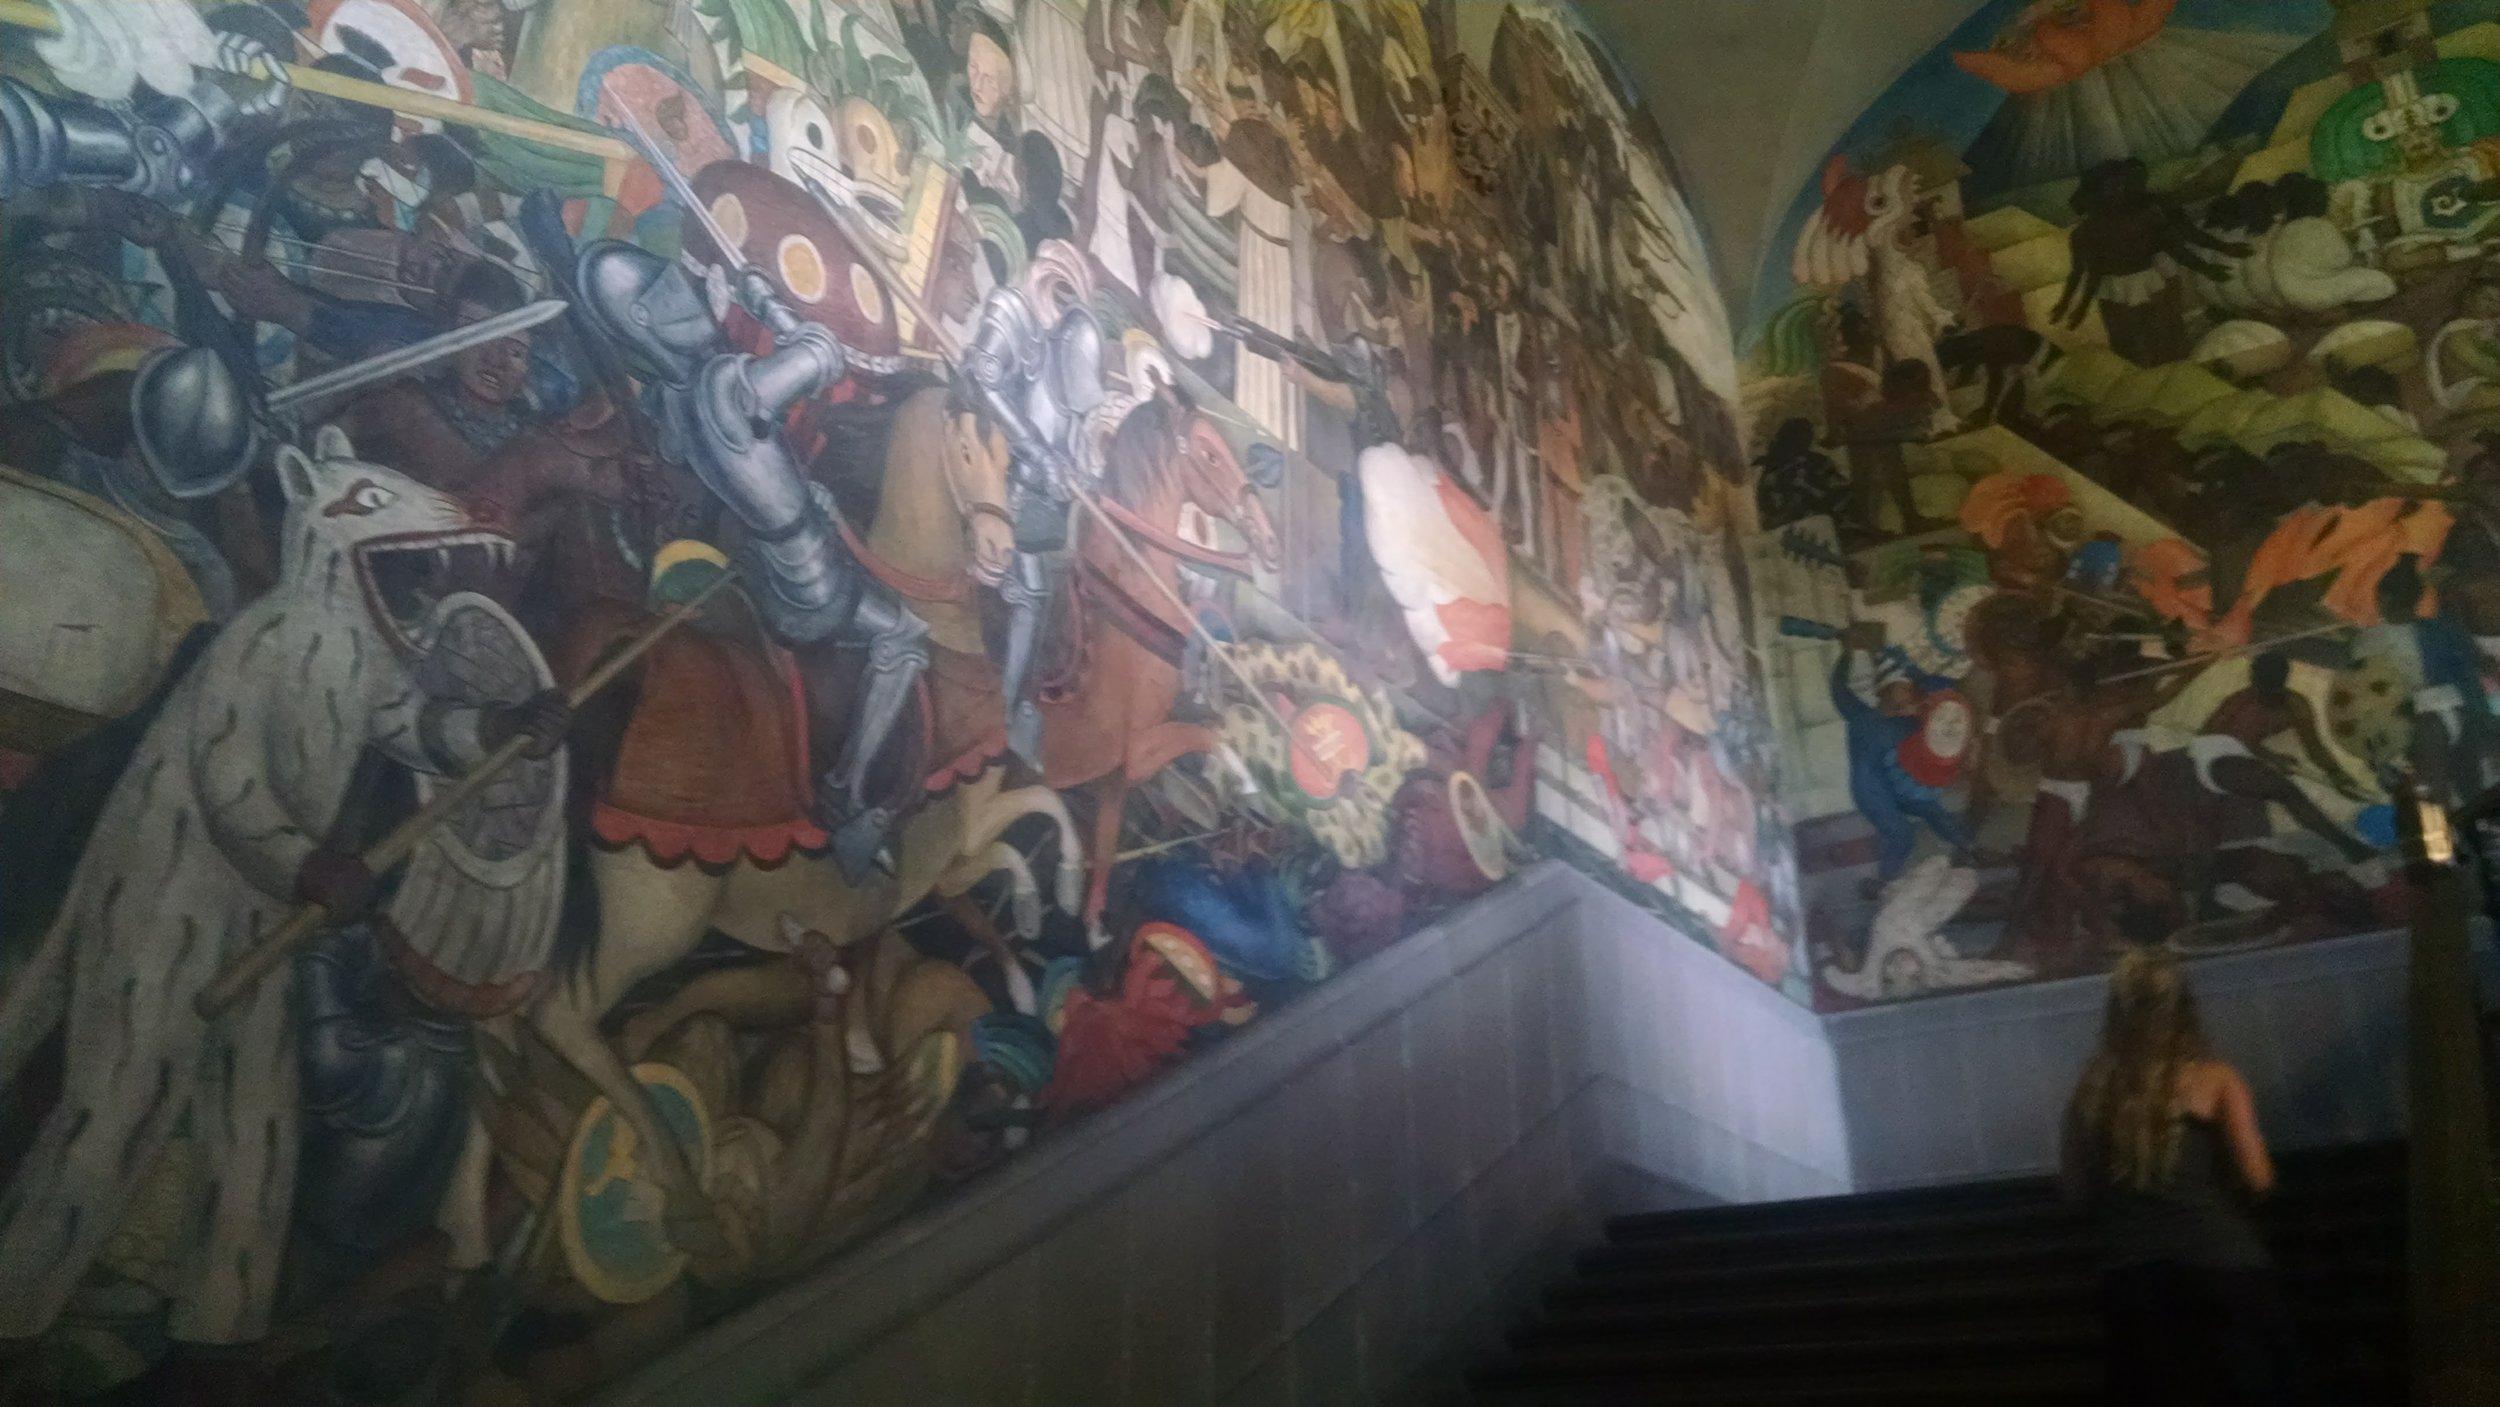 Palace Mural